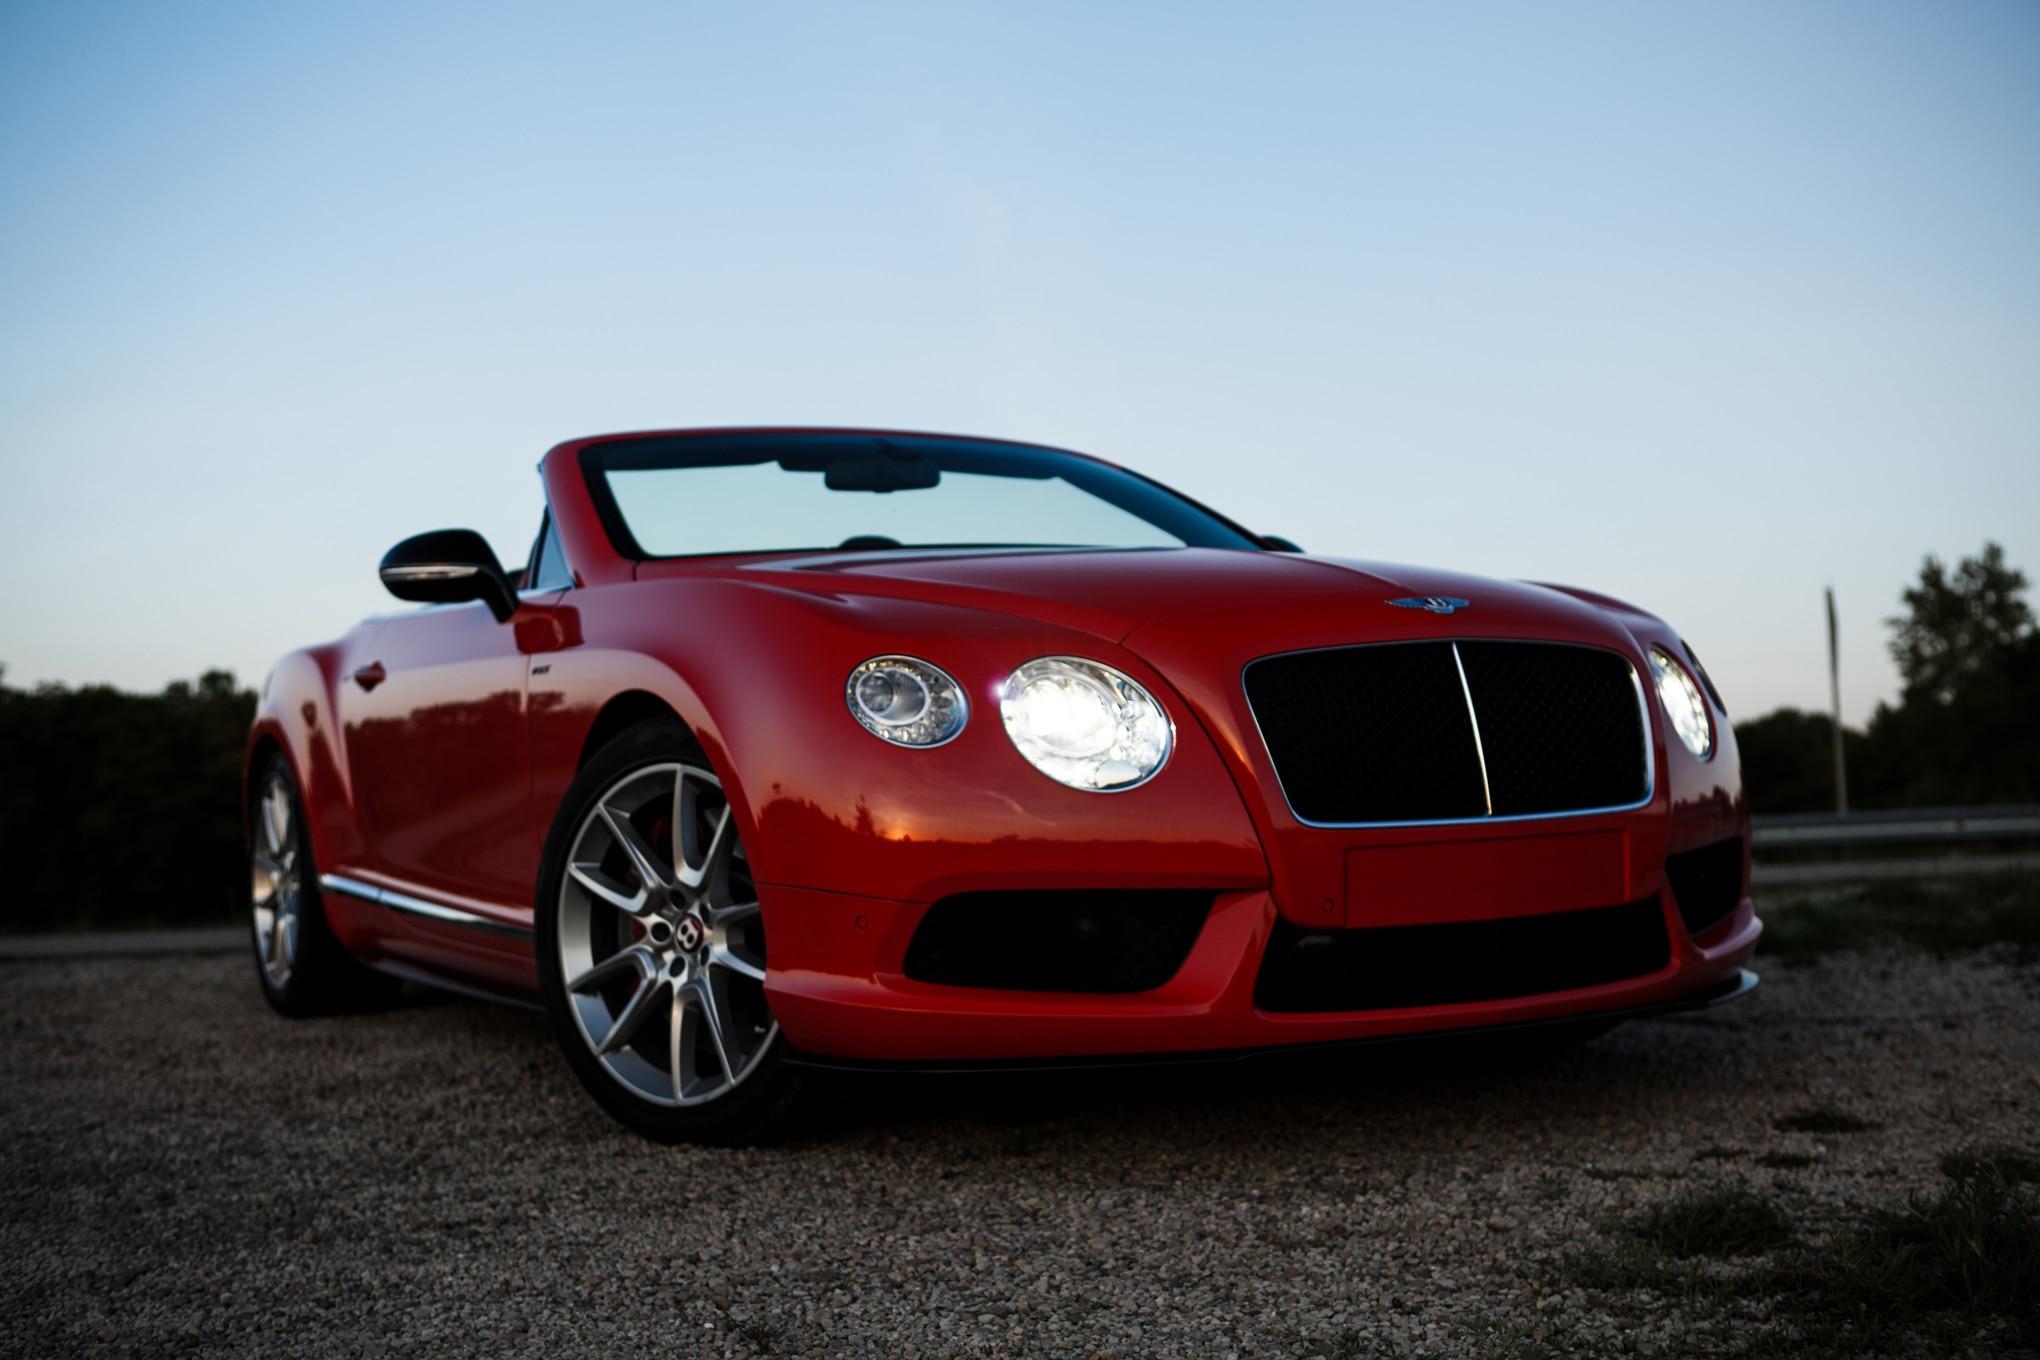 2014 Bentley Continental GT V8 S Convertible Front Headlight1